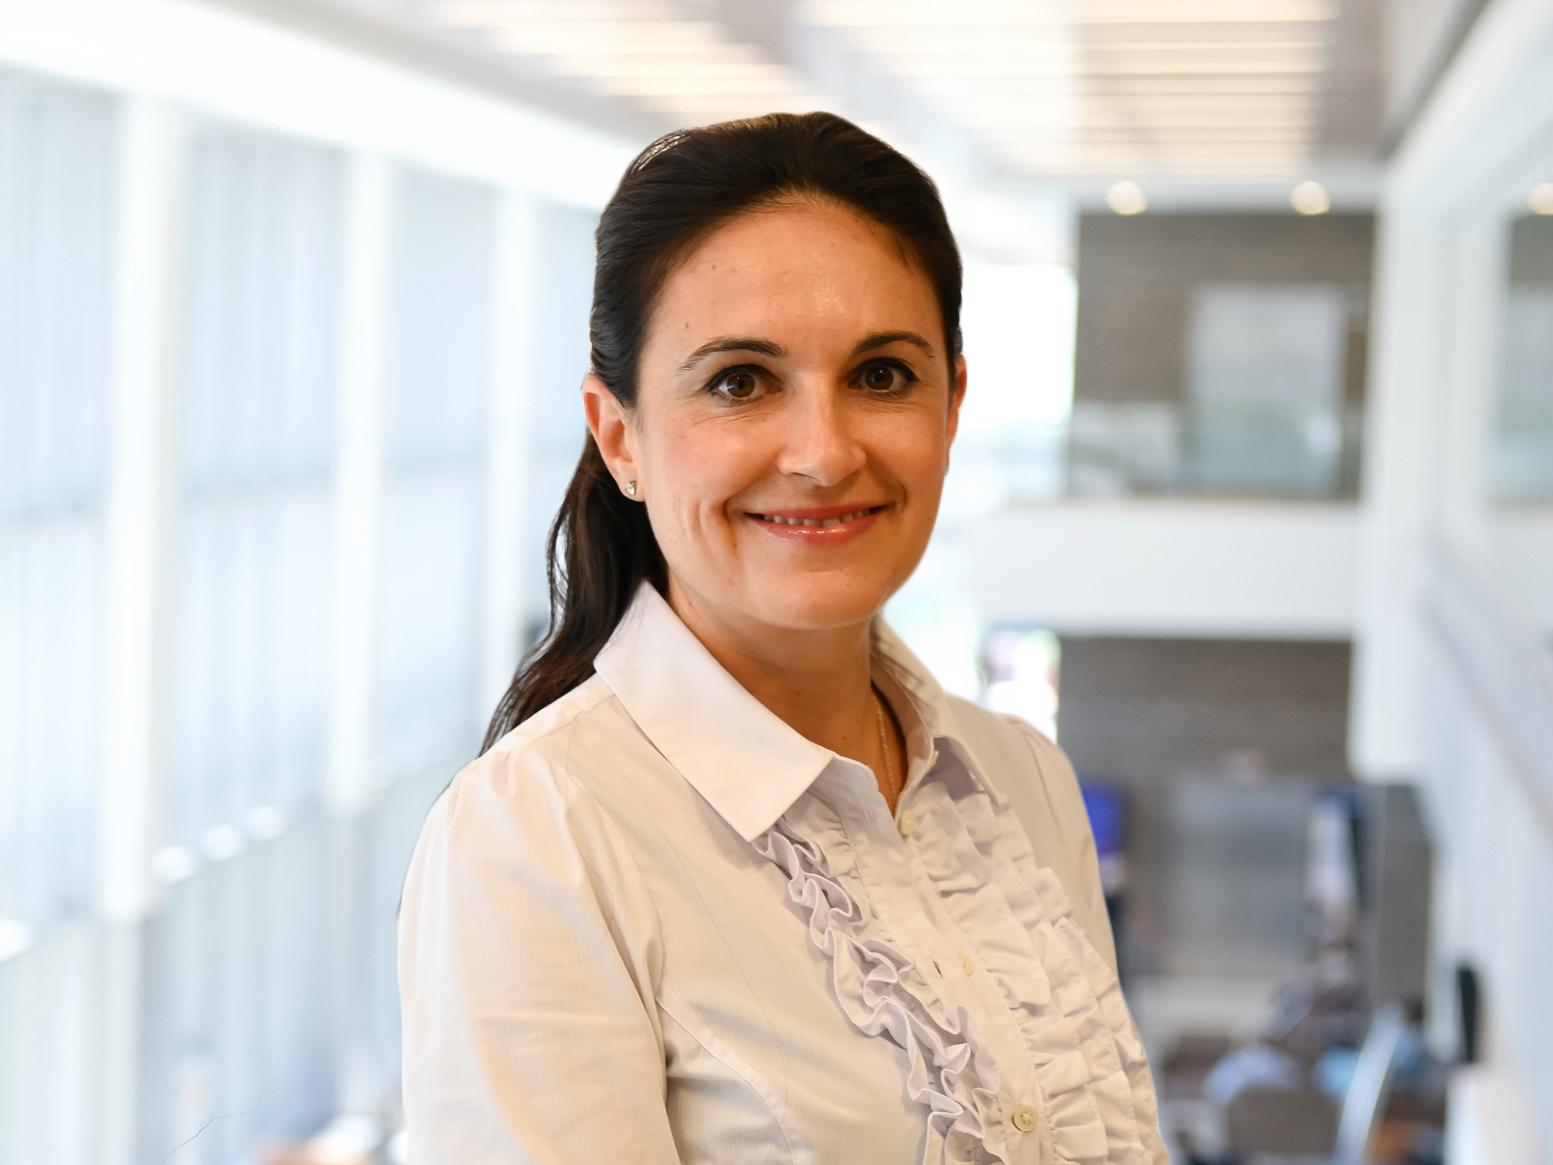 Dr. Melinda Maggisano